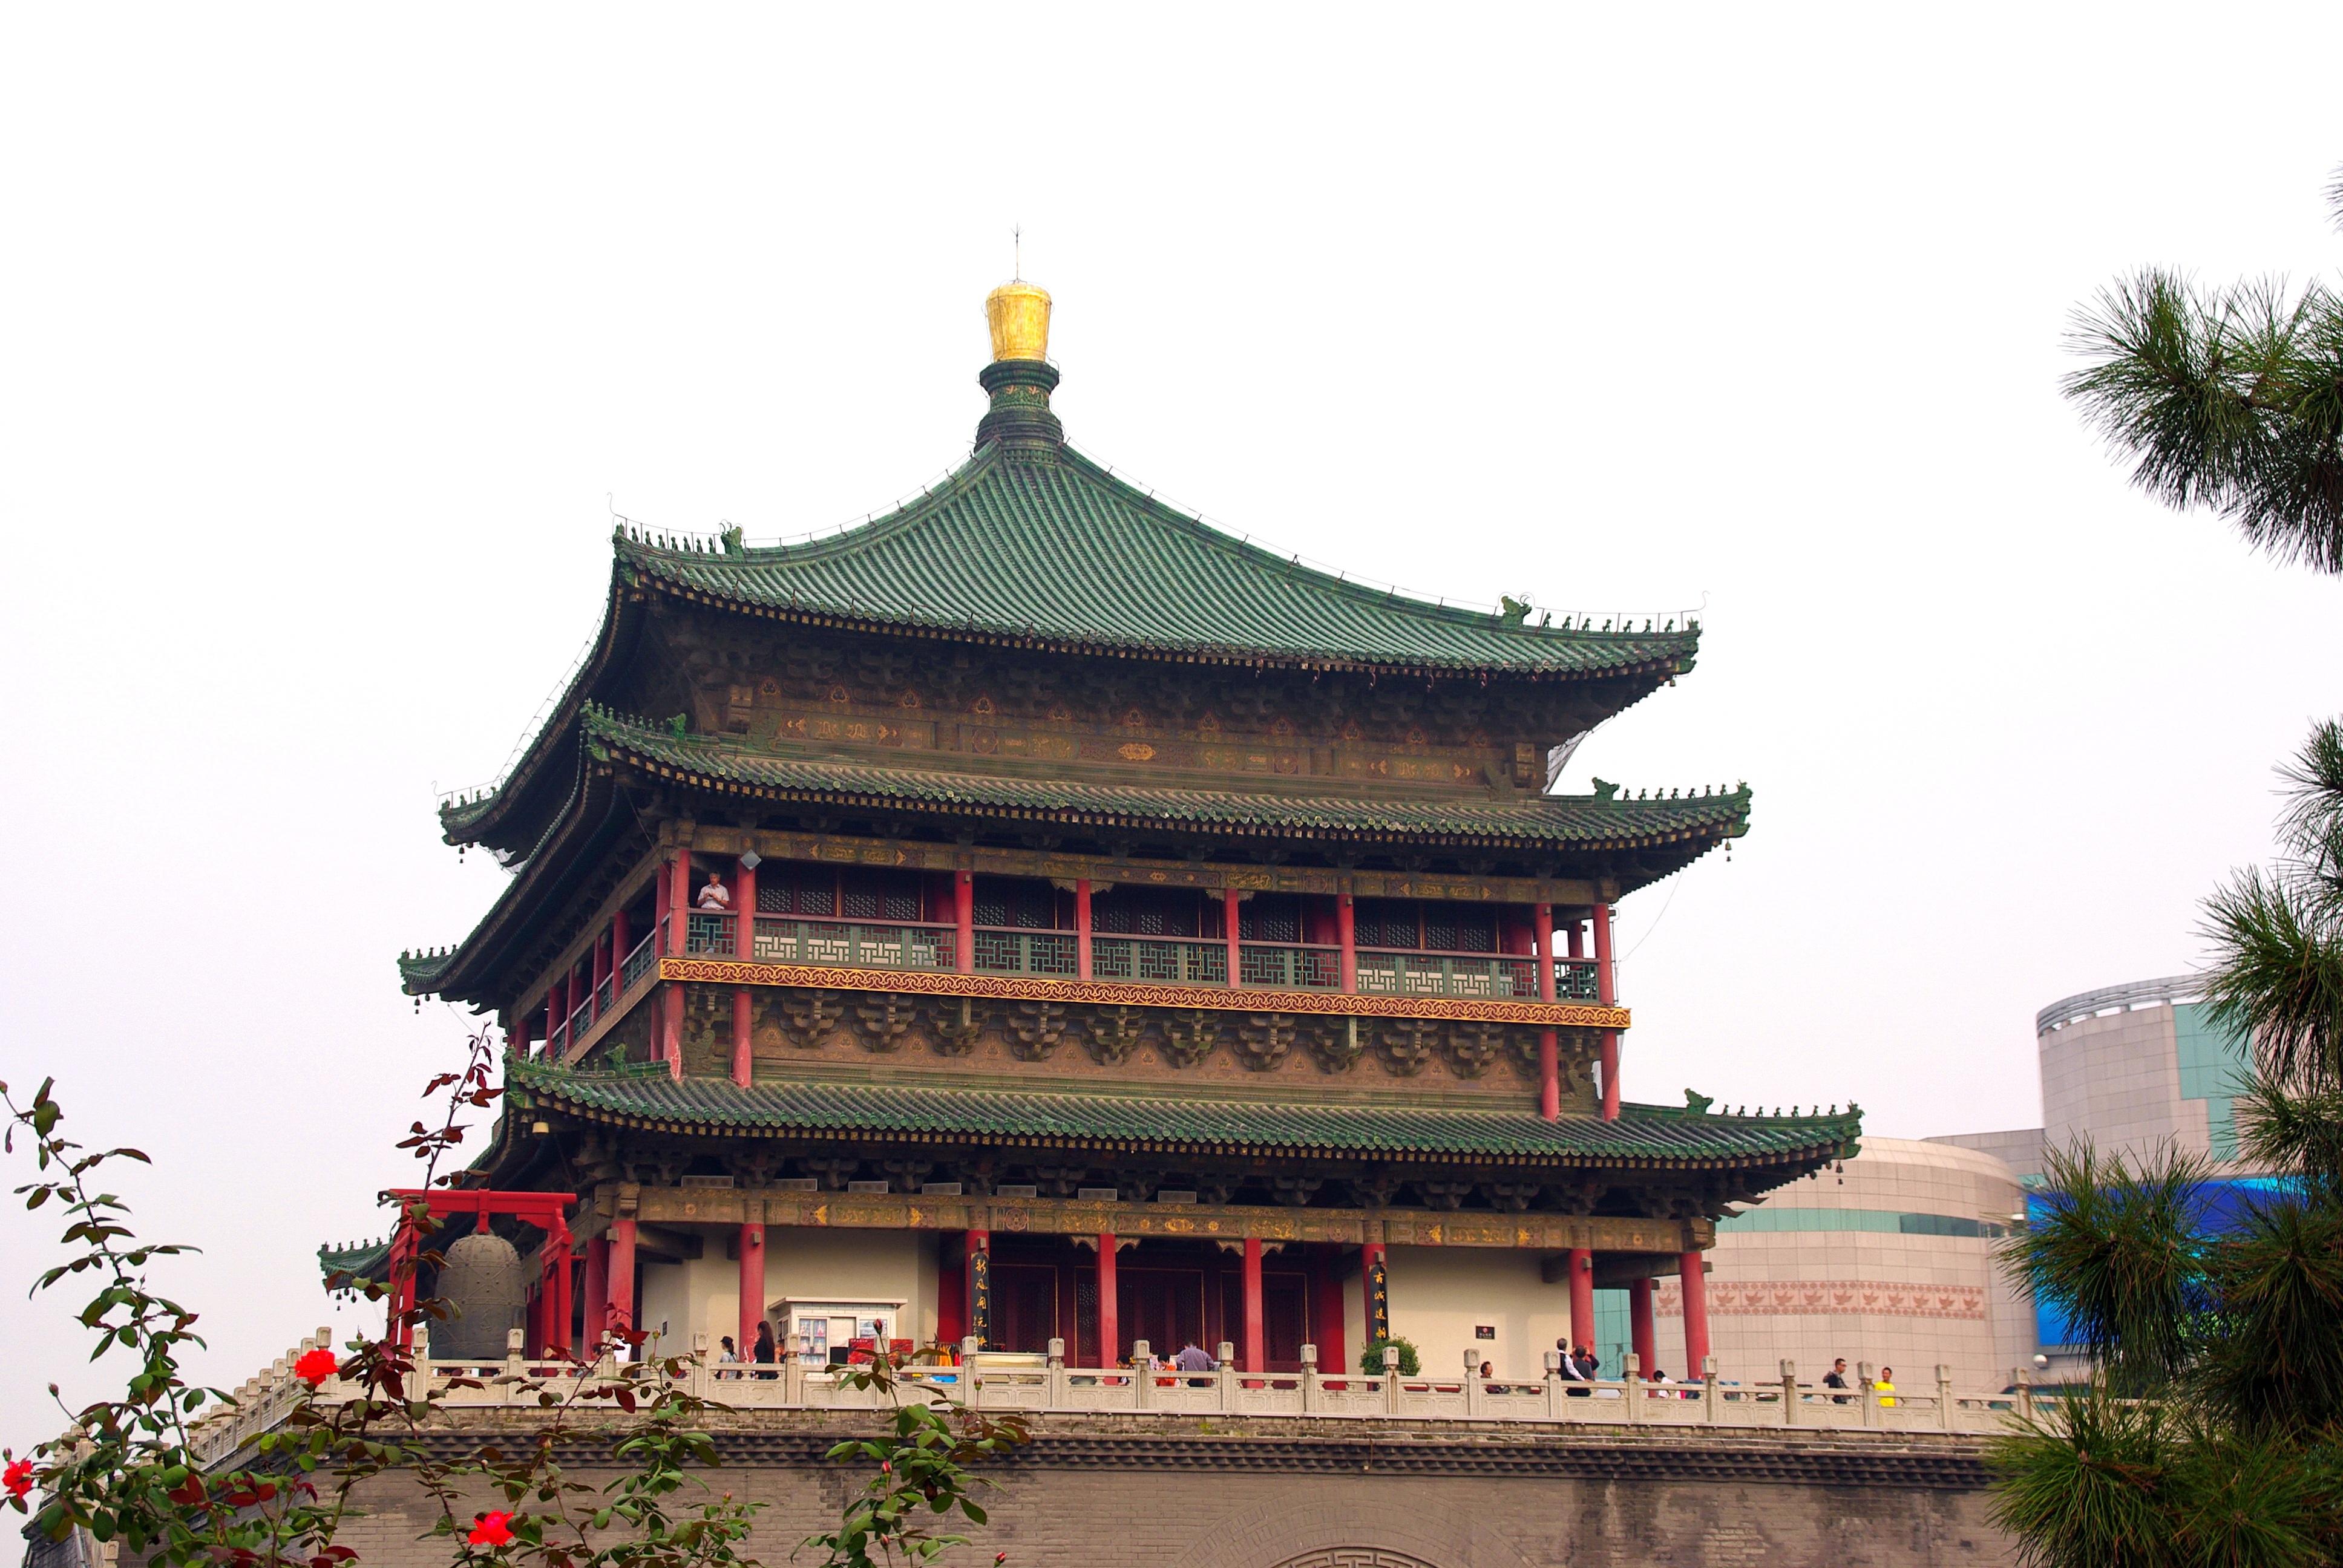 Картинка китайская башня